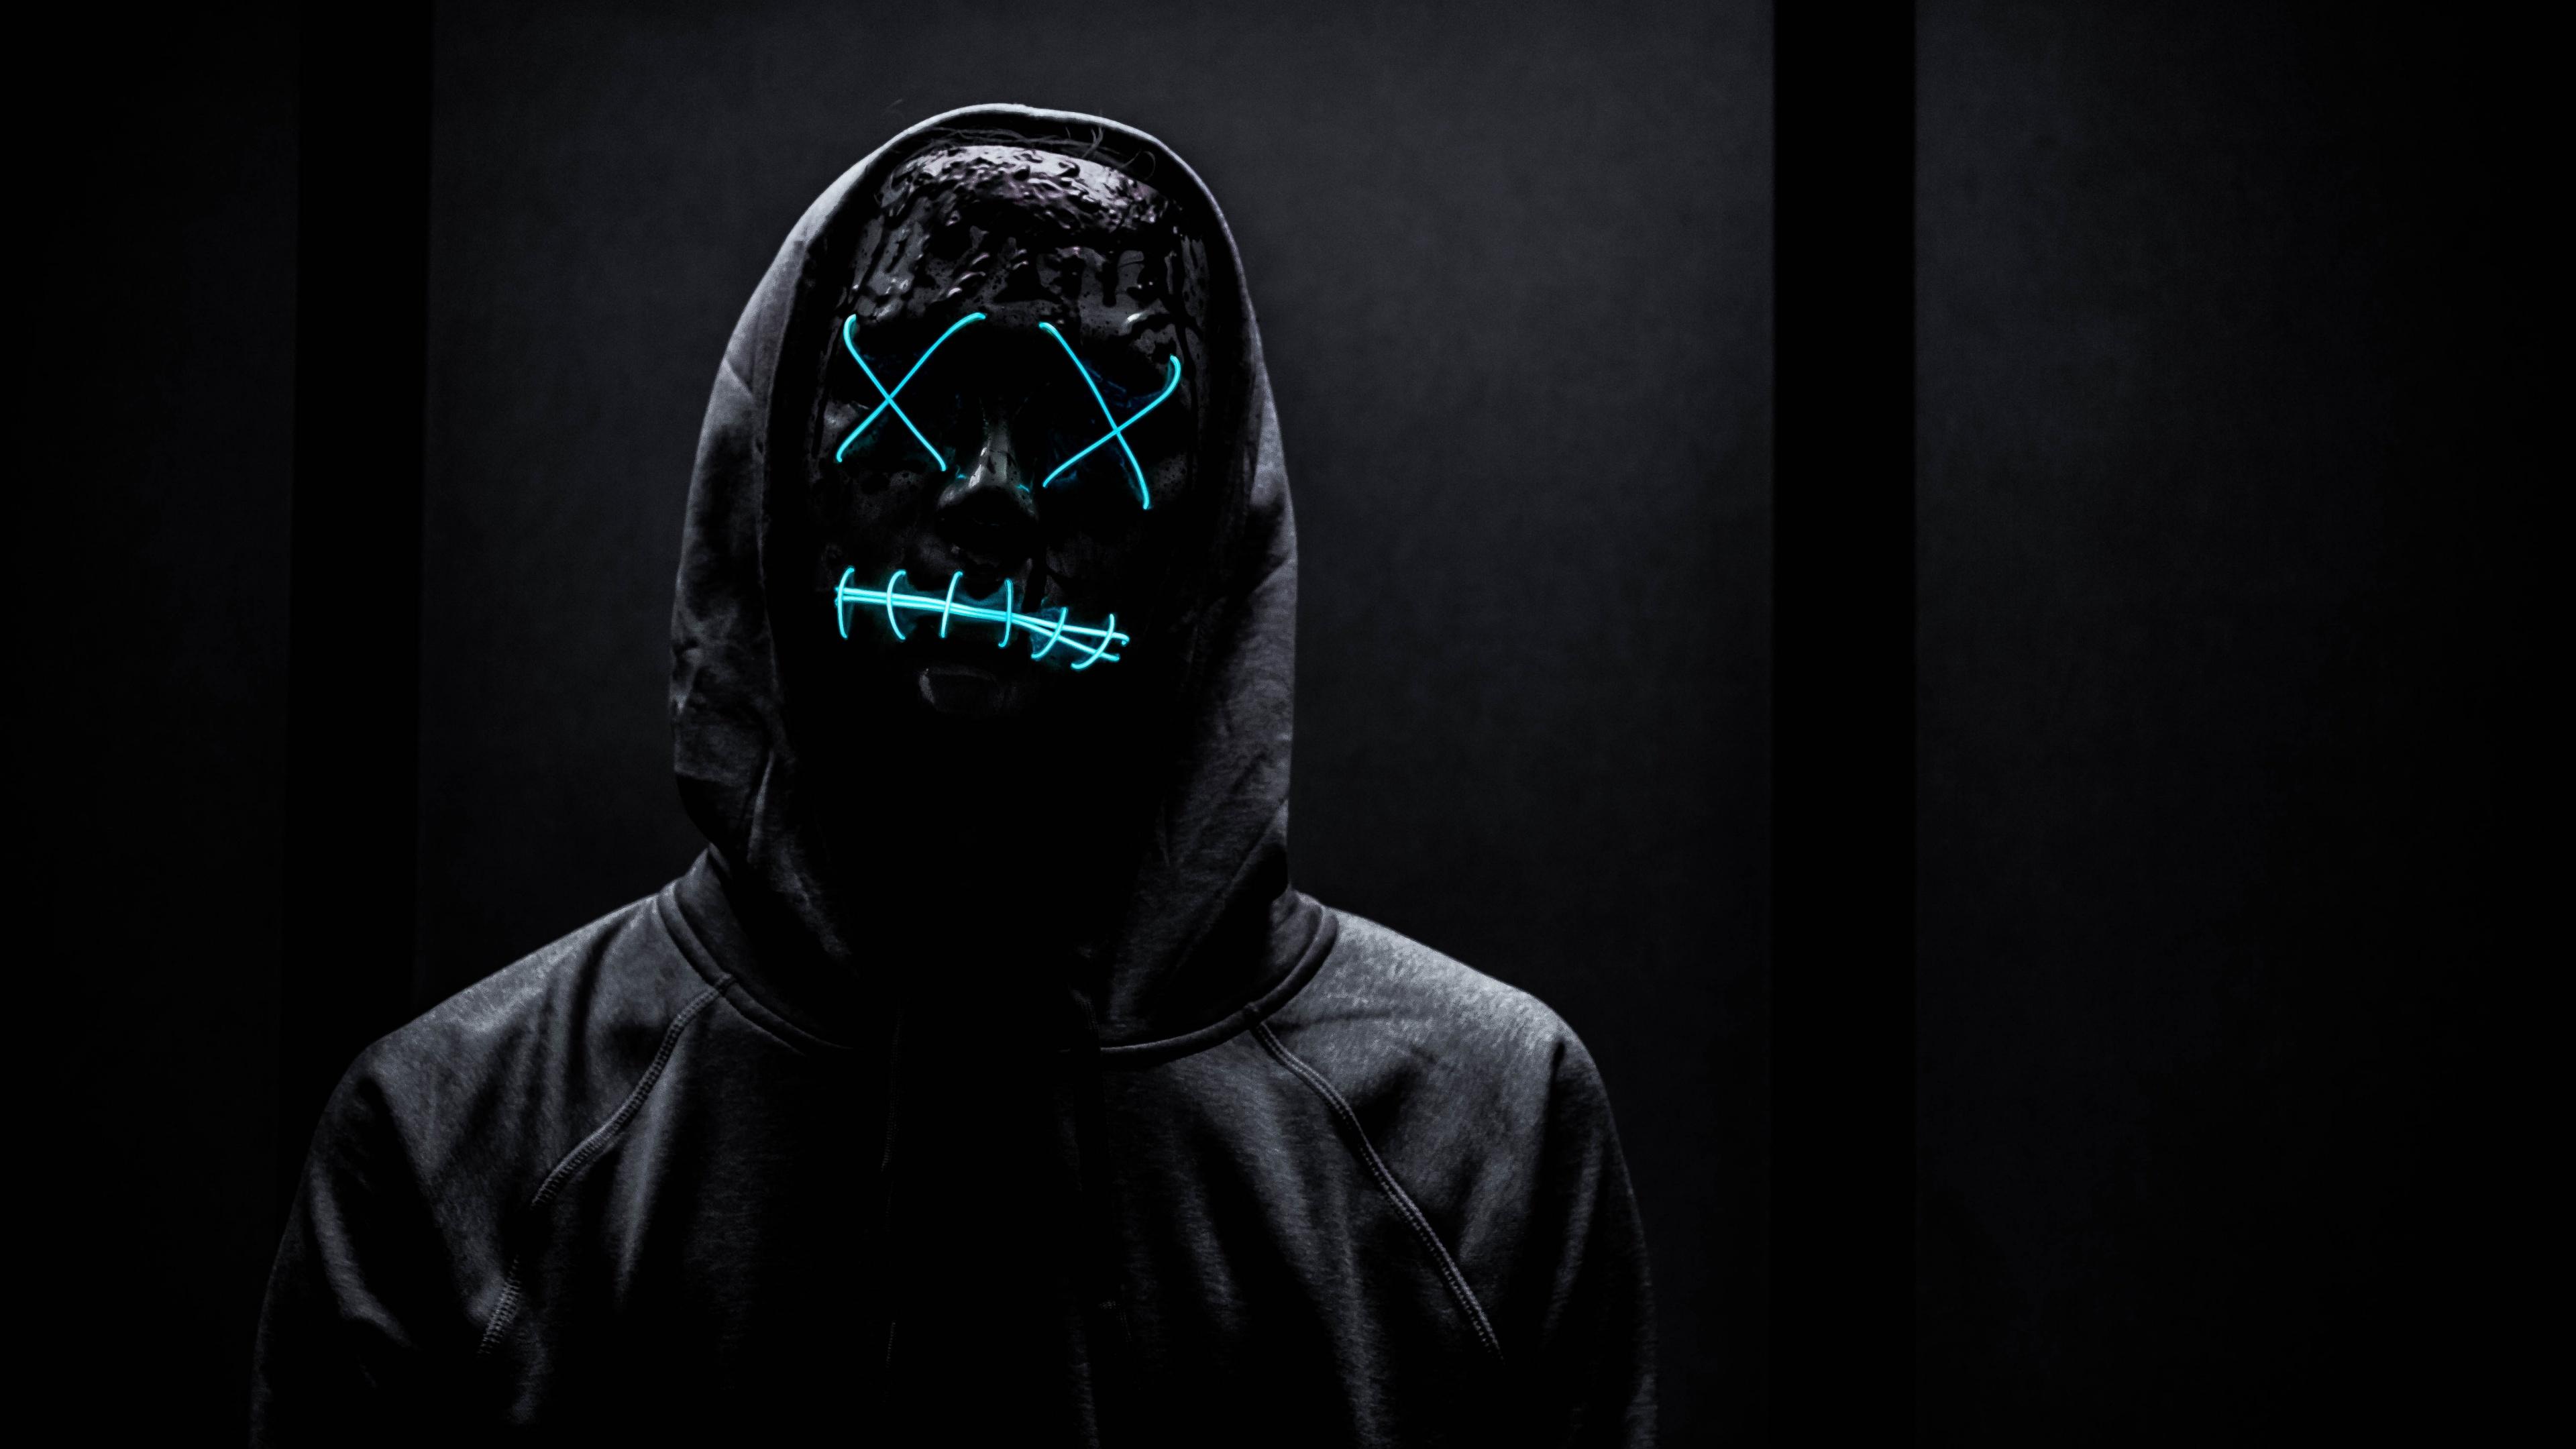 Neon Mask 4k Wallpaper Man In Black Dark Background Hoodie Blue Light 5k Photography 2162